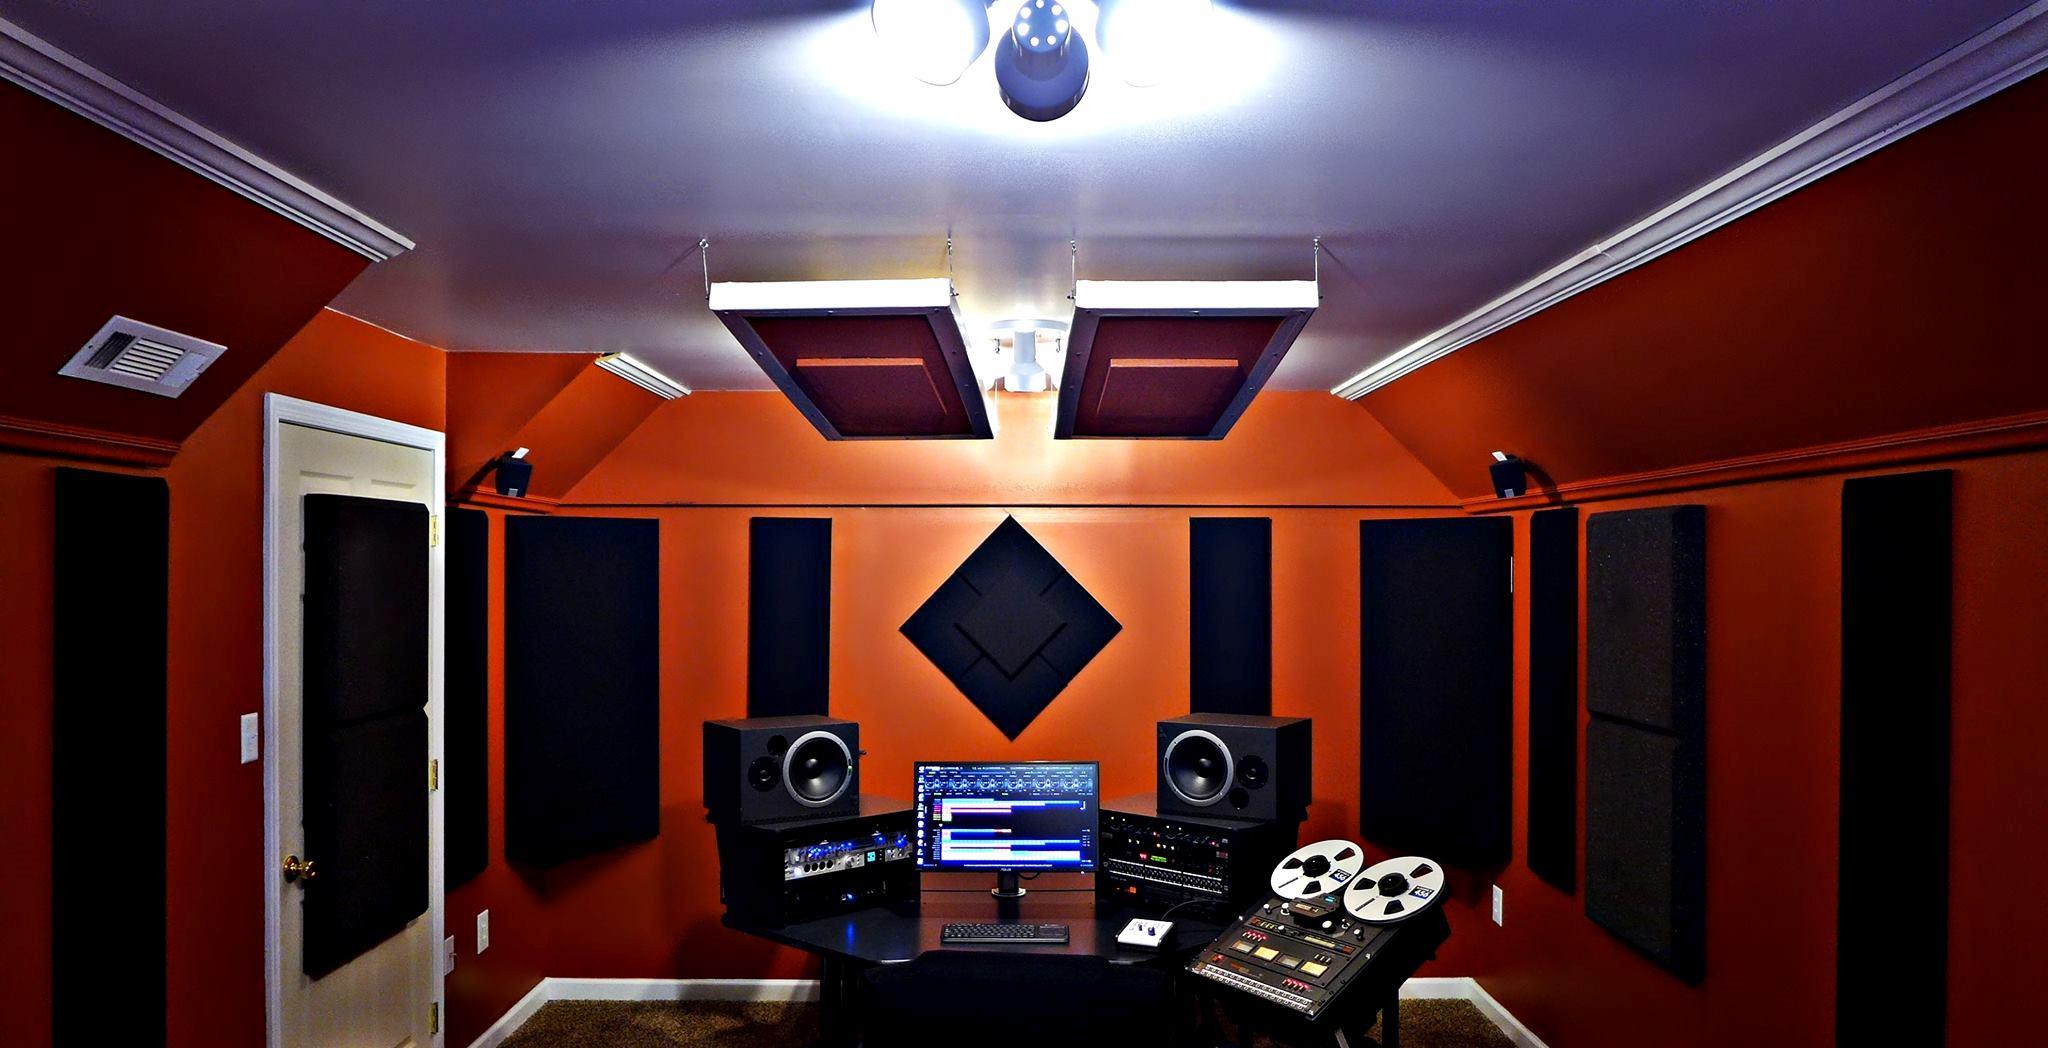 The Upper Room Studio now is using Orion Studio